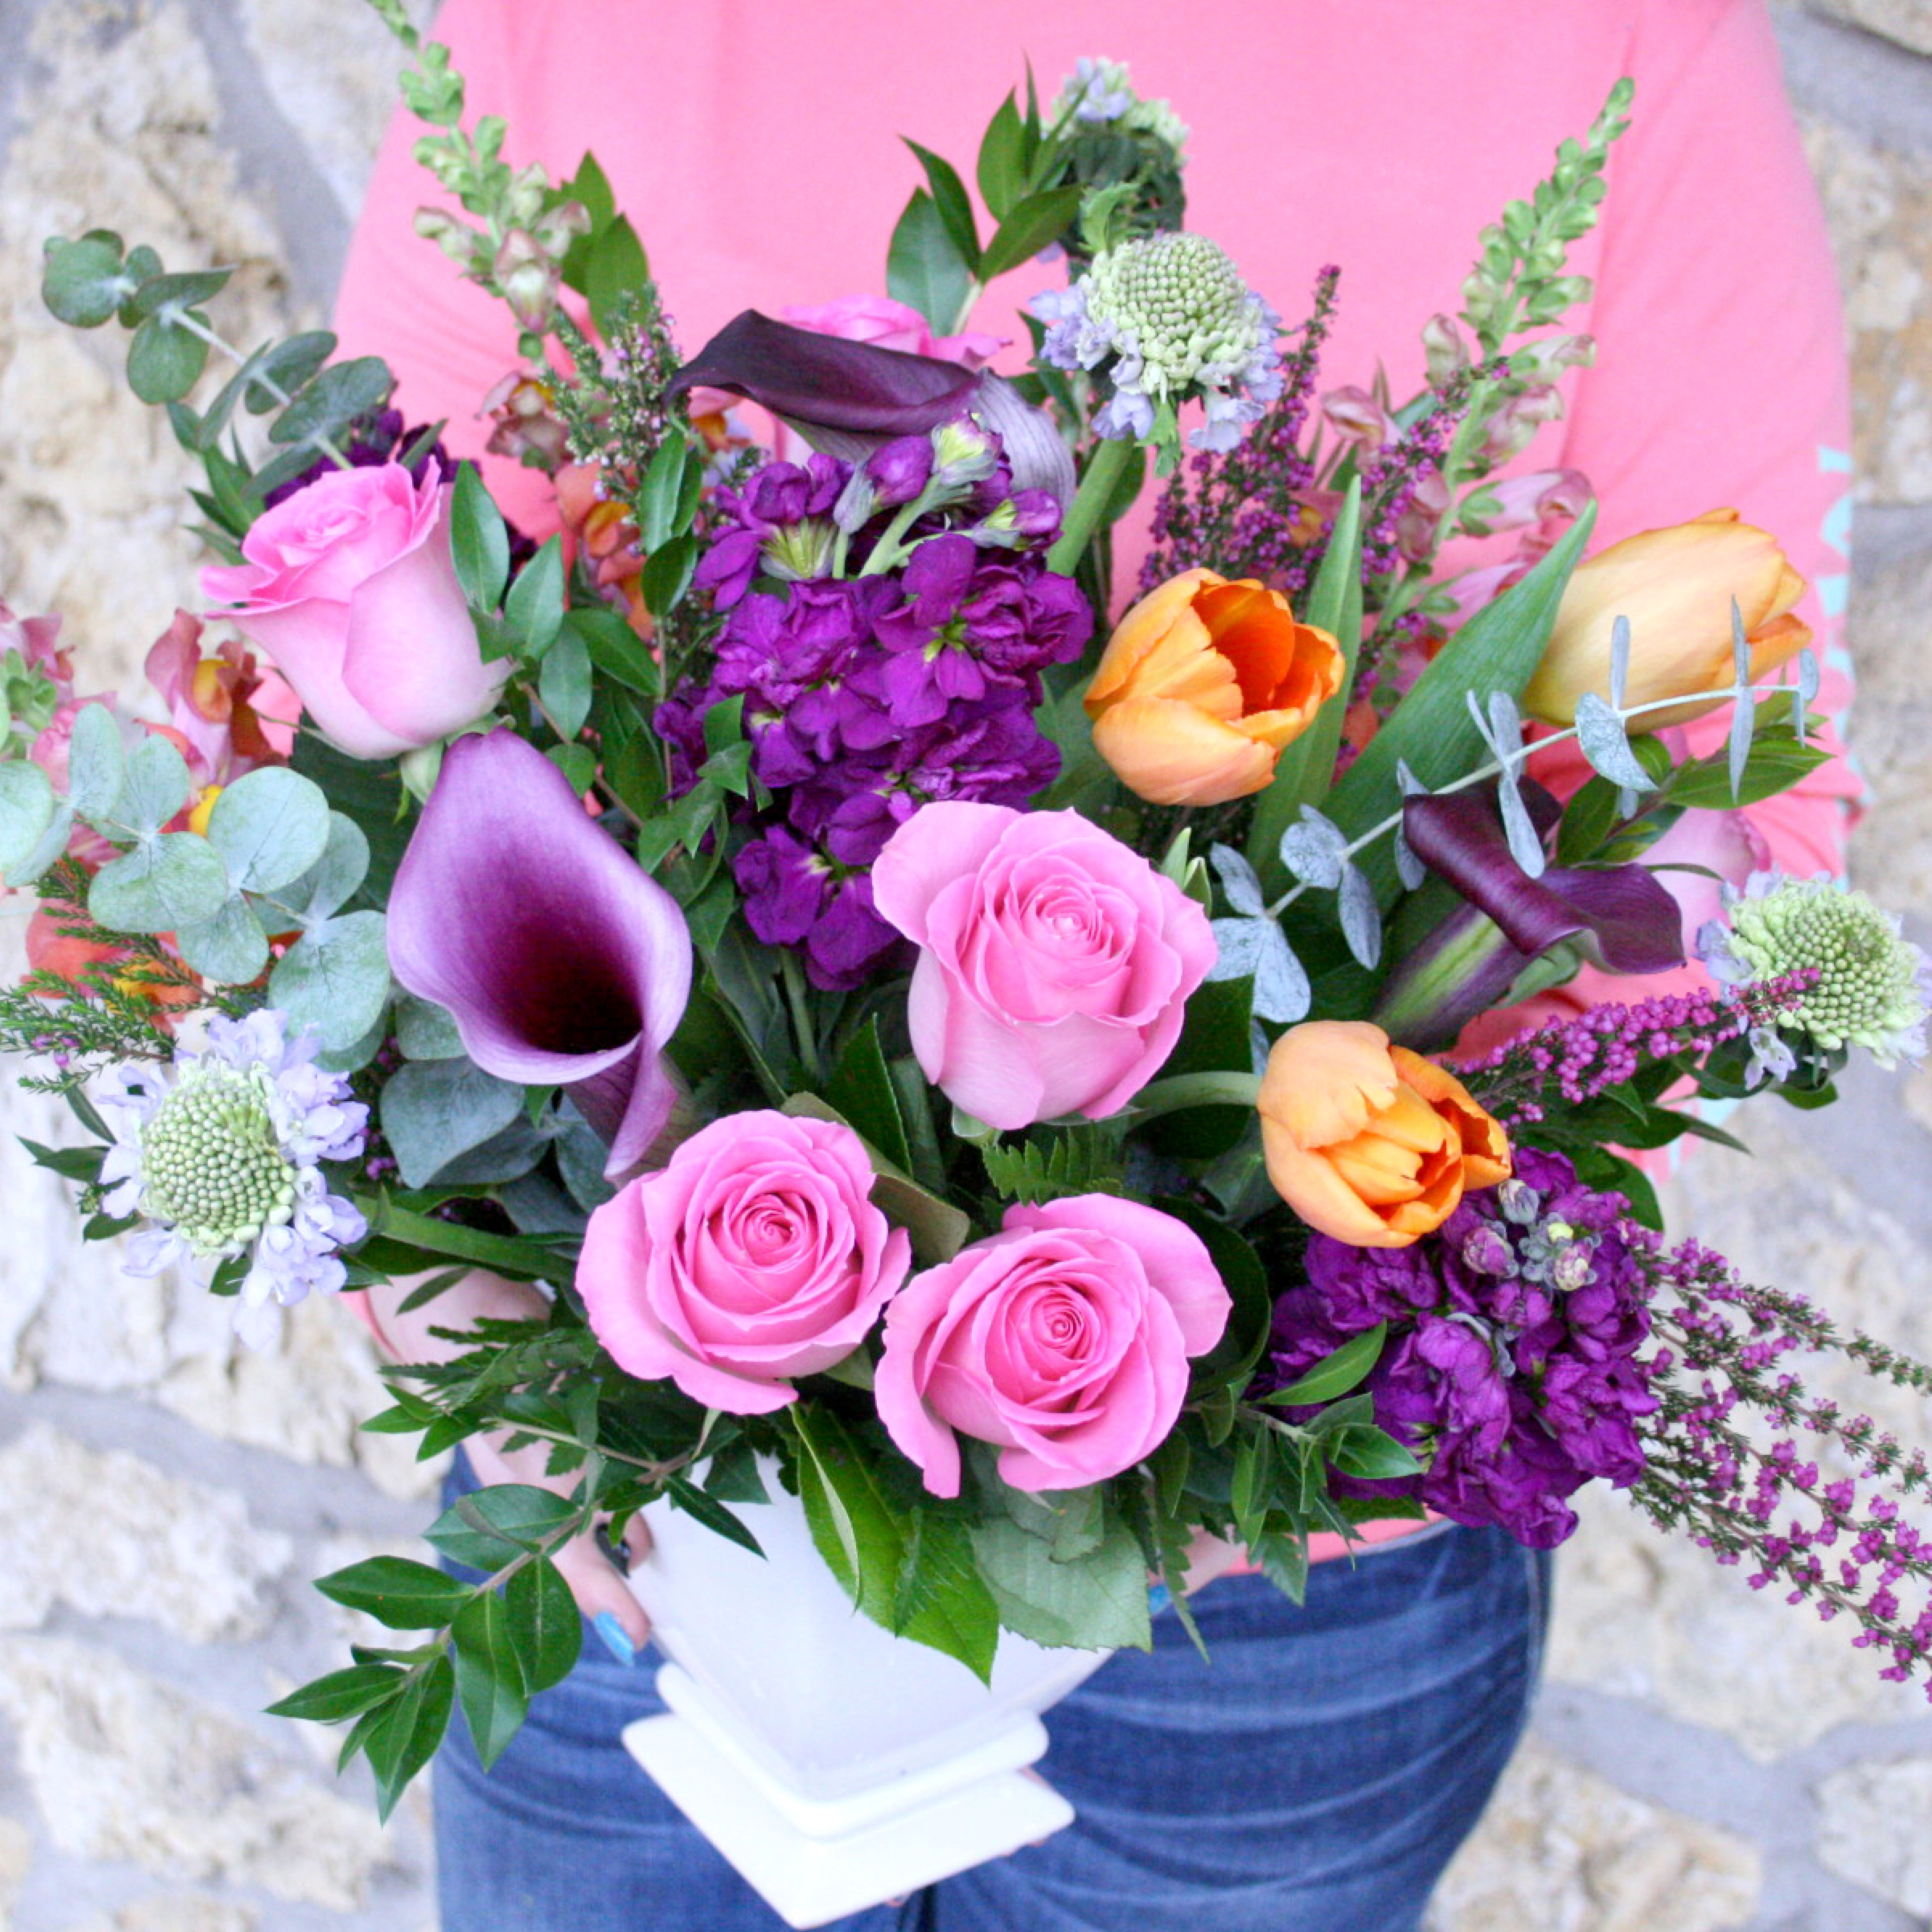 Beautiful arrangement with roses tulips and eucalyptus